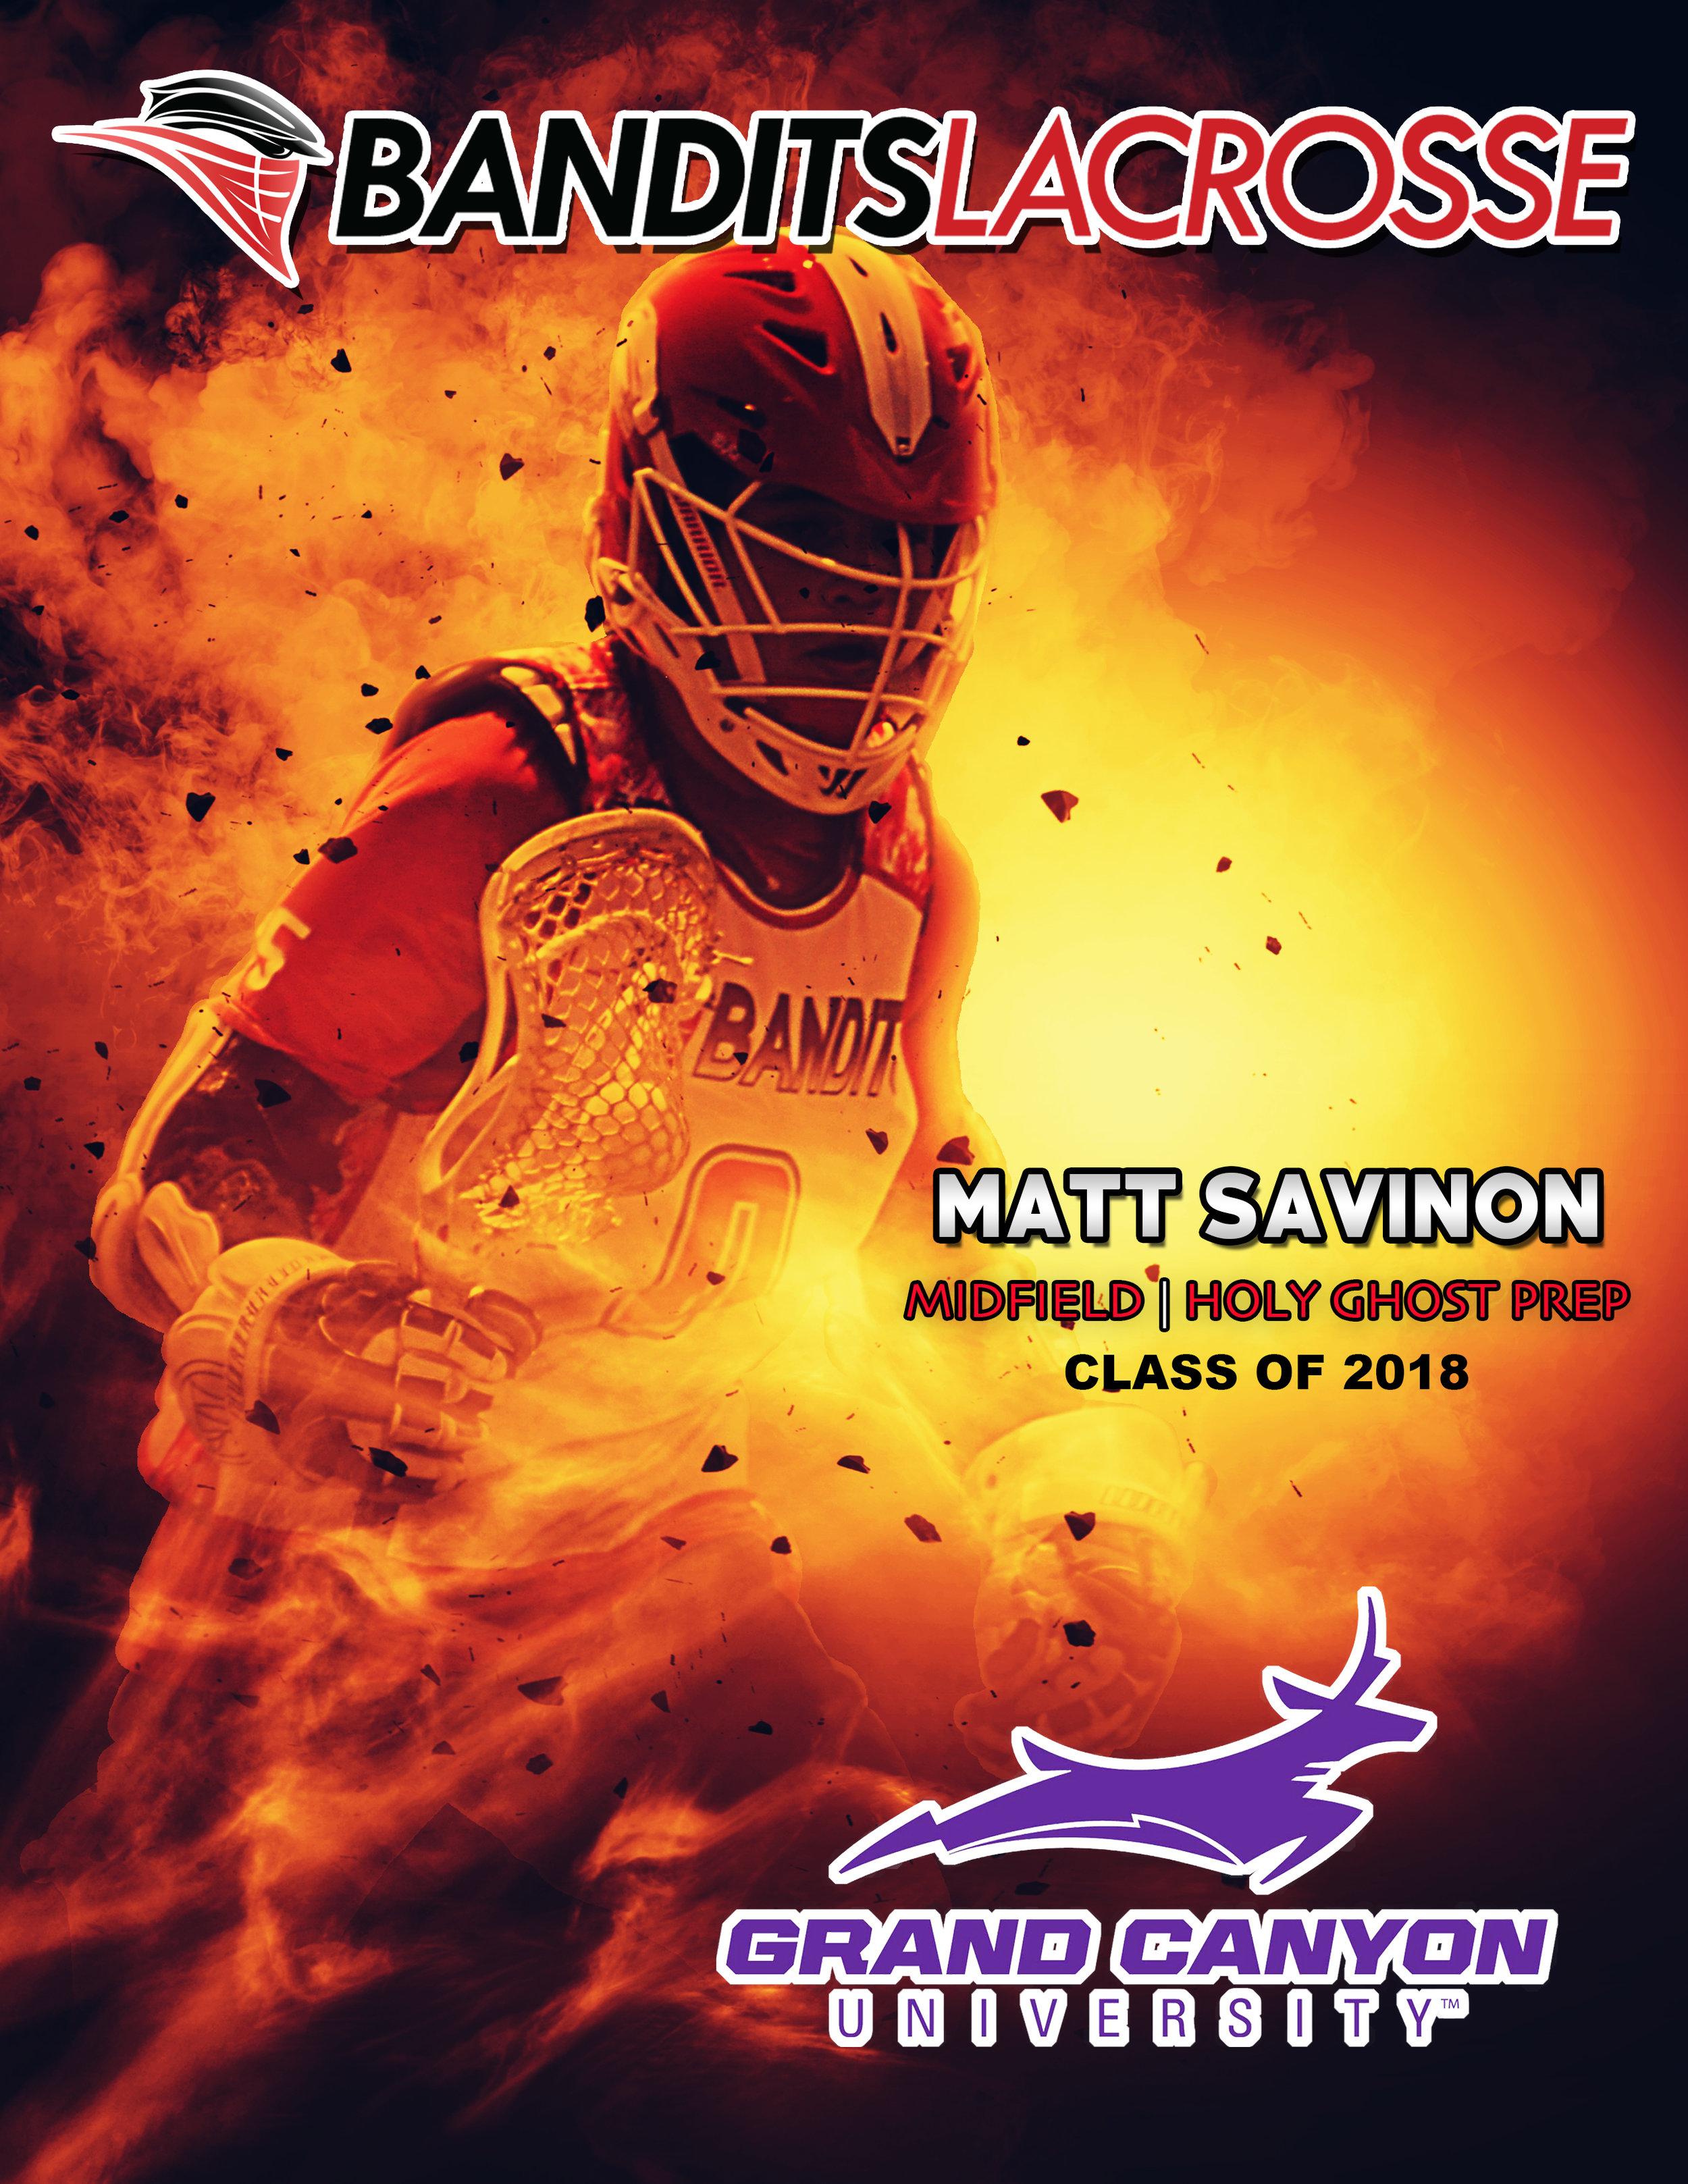 Bandits Lacrosse Commitment Poster - Matt Savinon.jpg